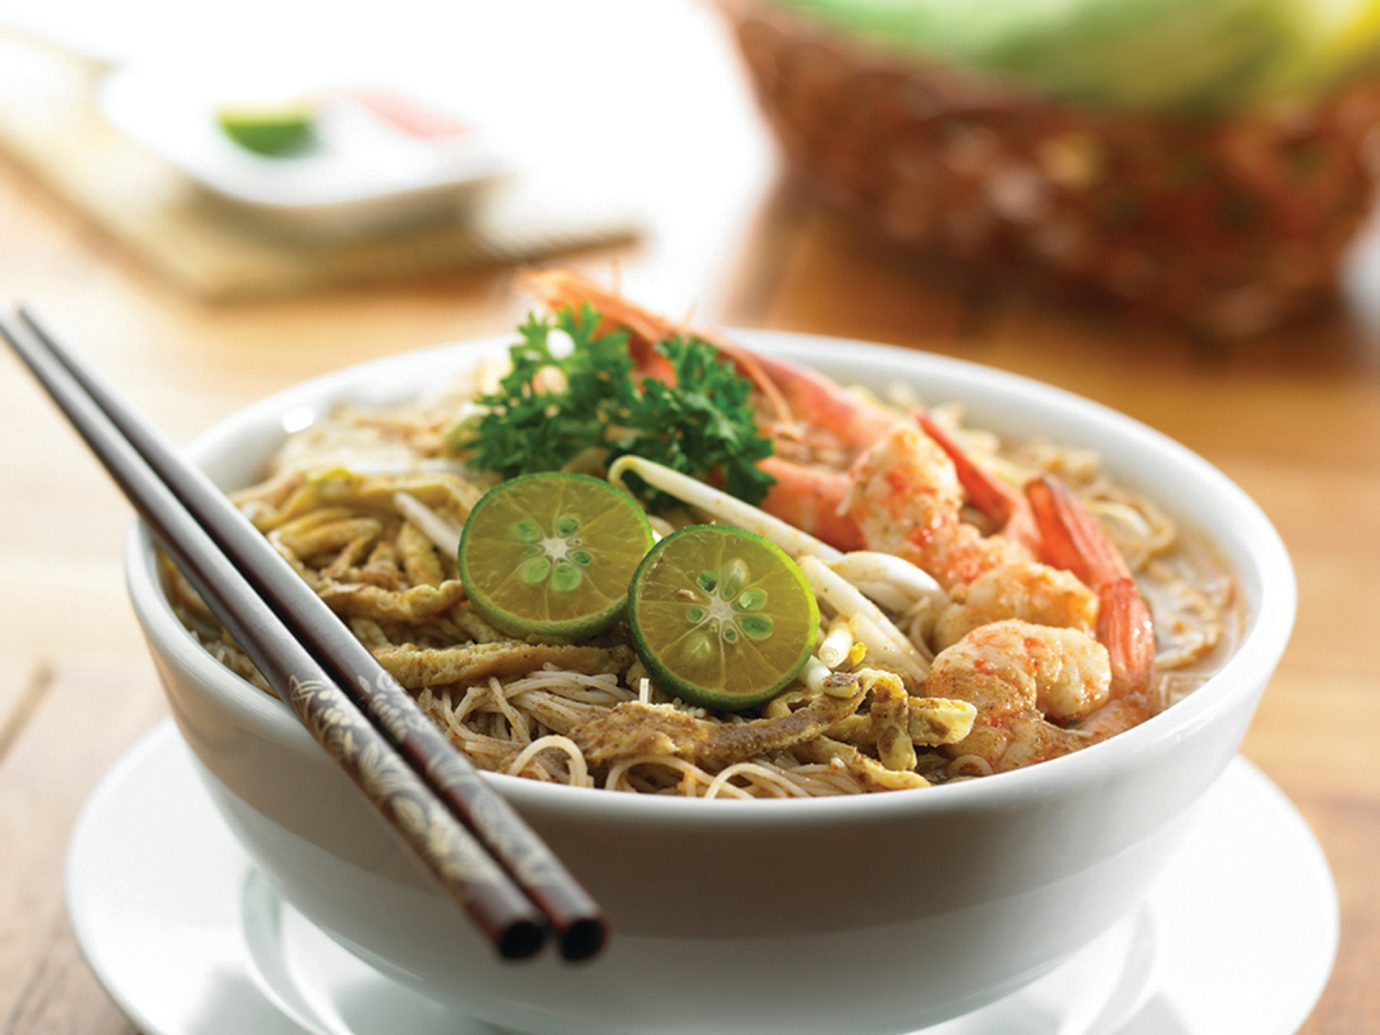 Offbeat food plate dish cuisine meal produce breakfast vegetable vegetarian food asian food